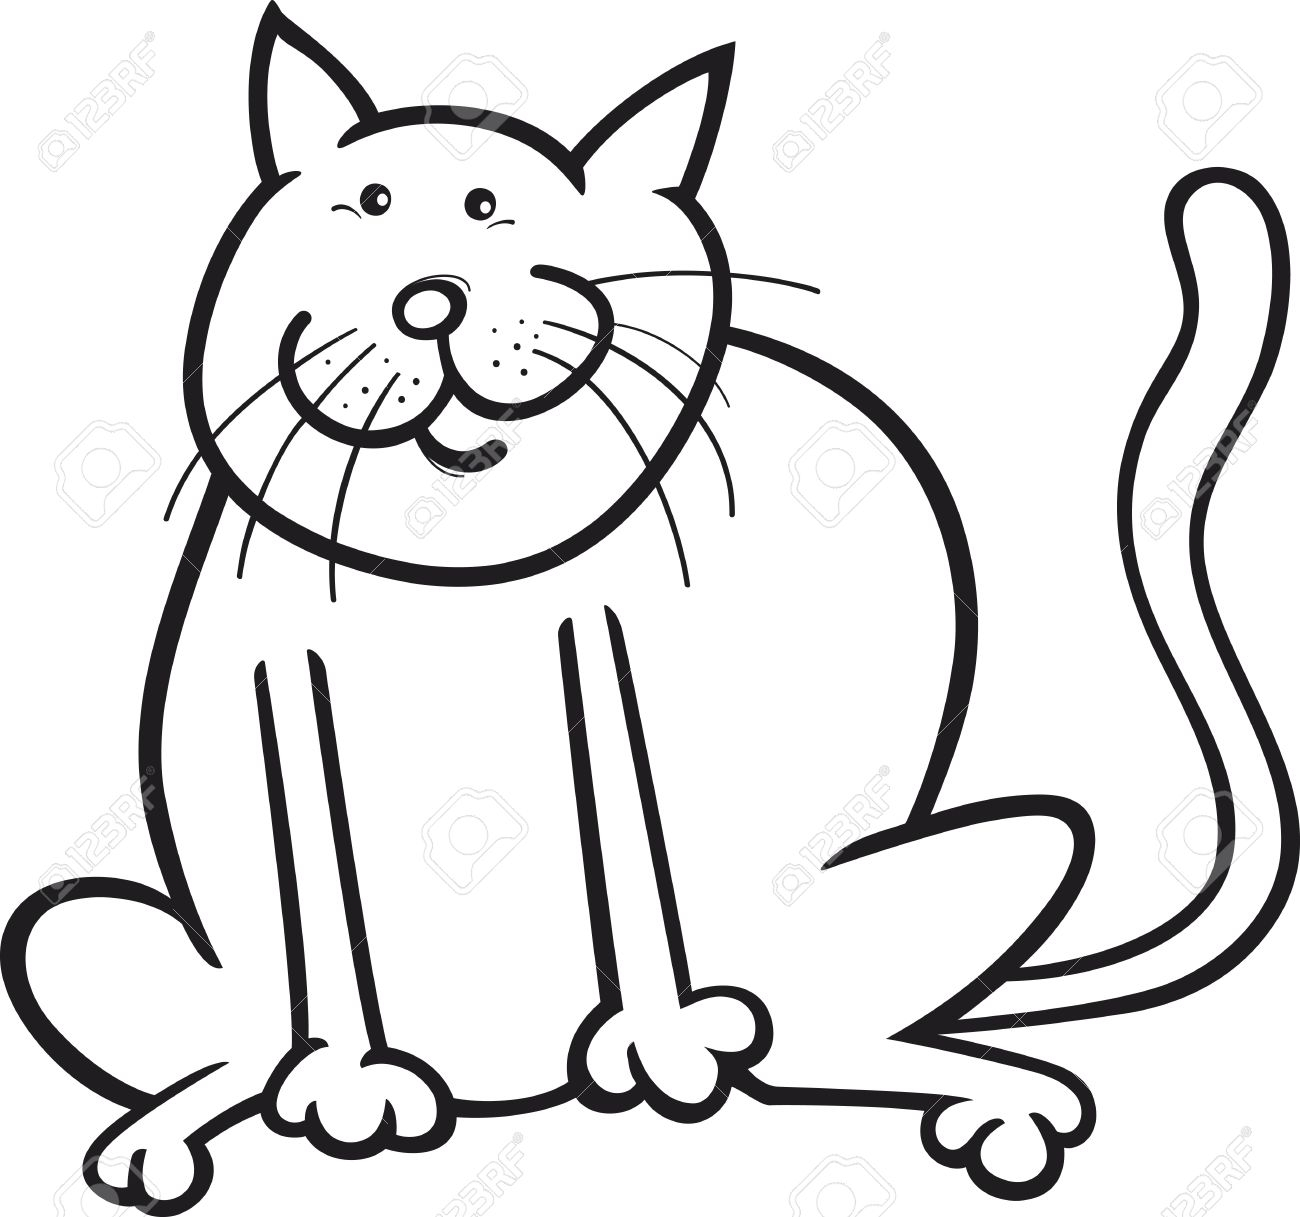 Fat Cat Silhouette At Getdrawings